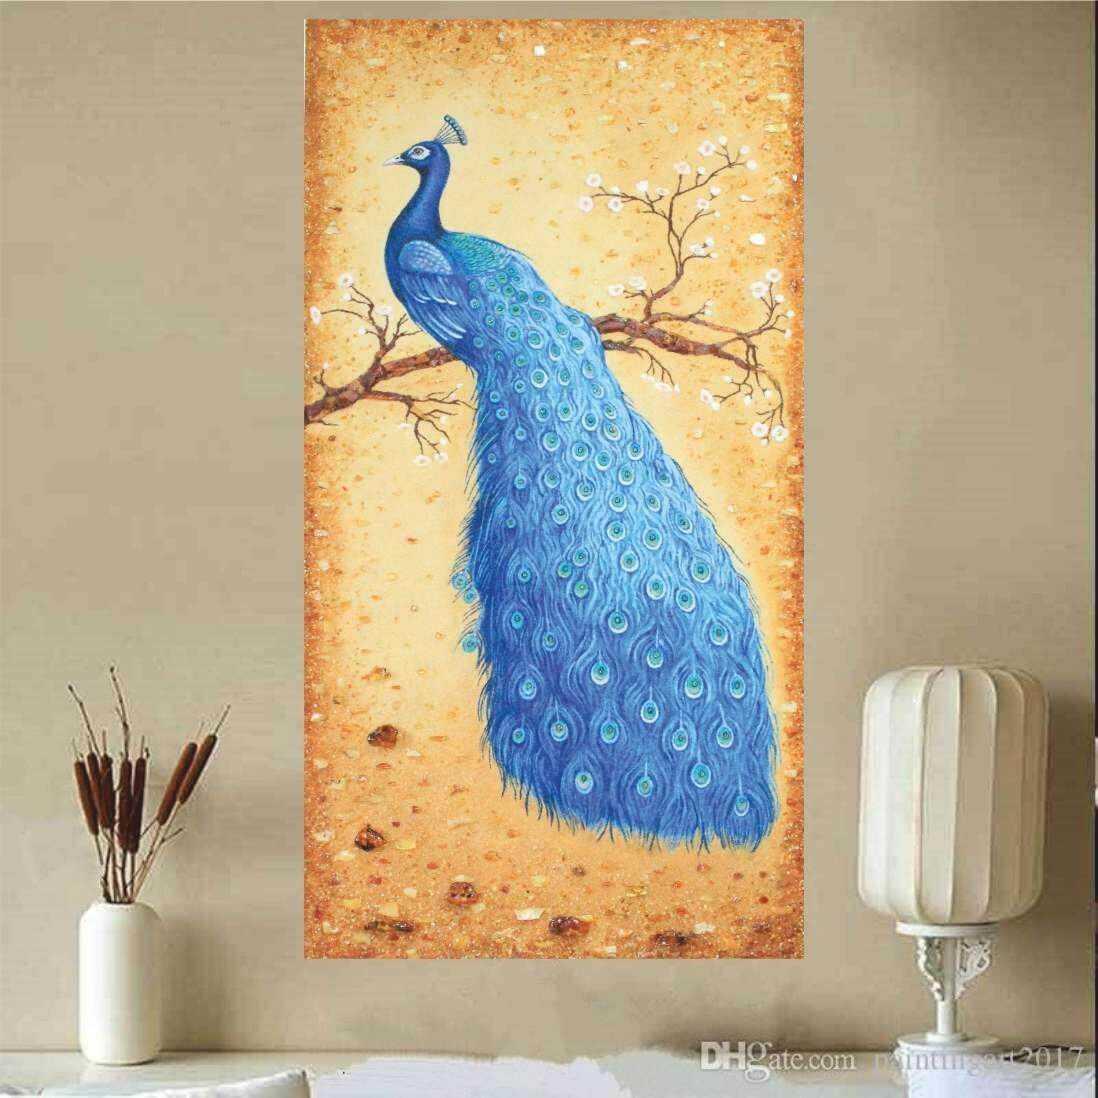 Картина из янтаря павлин